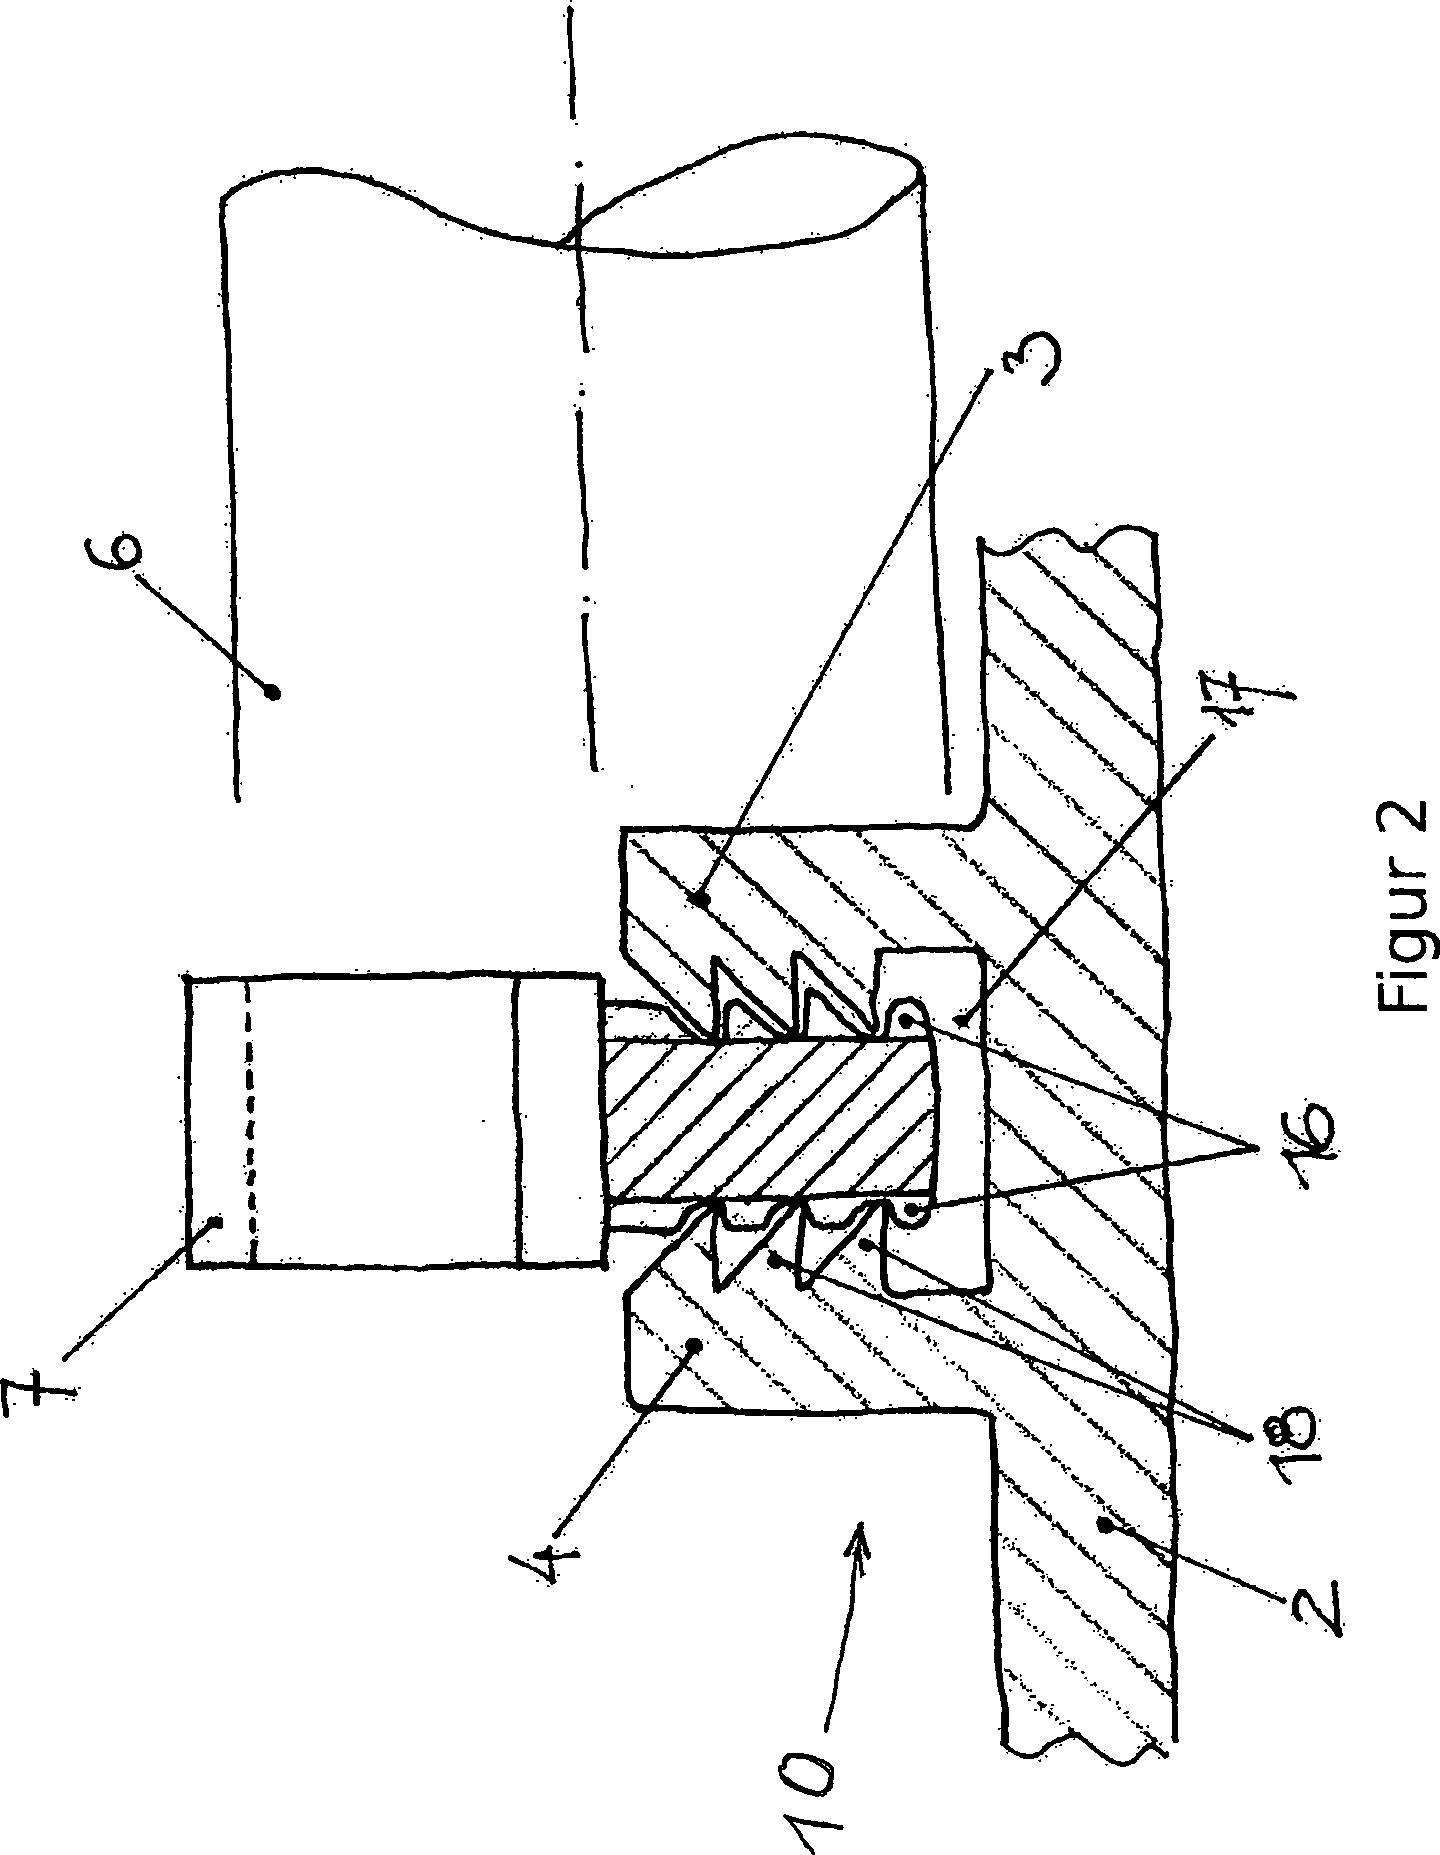 patent de202013007360u1 befestigungsvorrichtung f r die. Black Bedroom Furniture Sets. Home Design Ideas